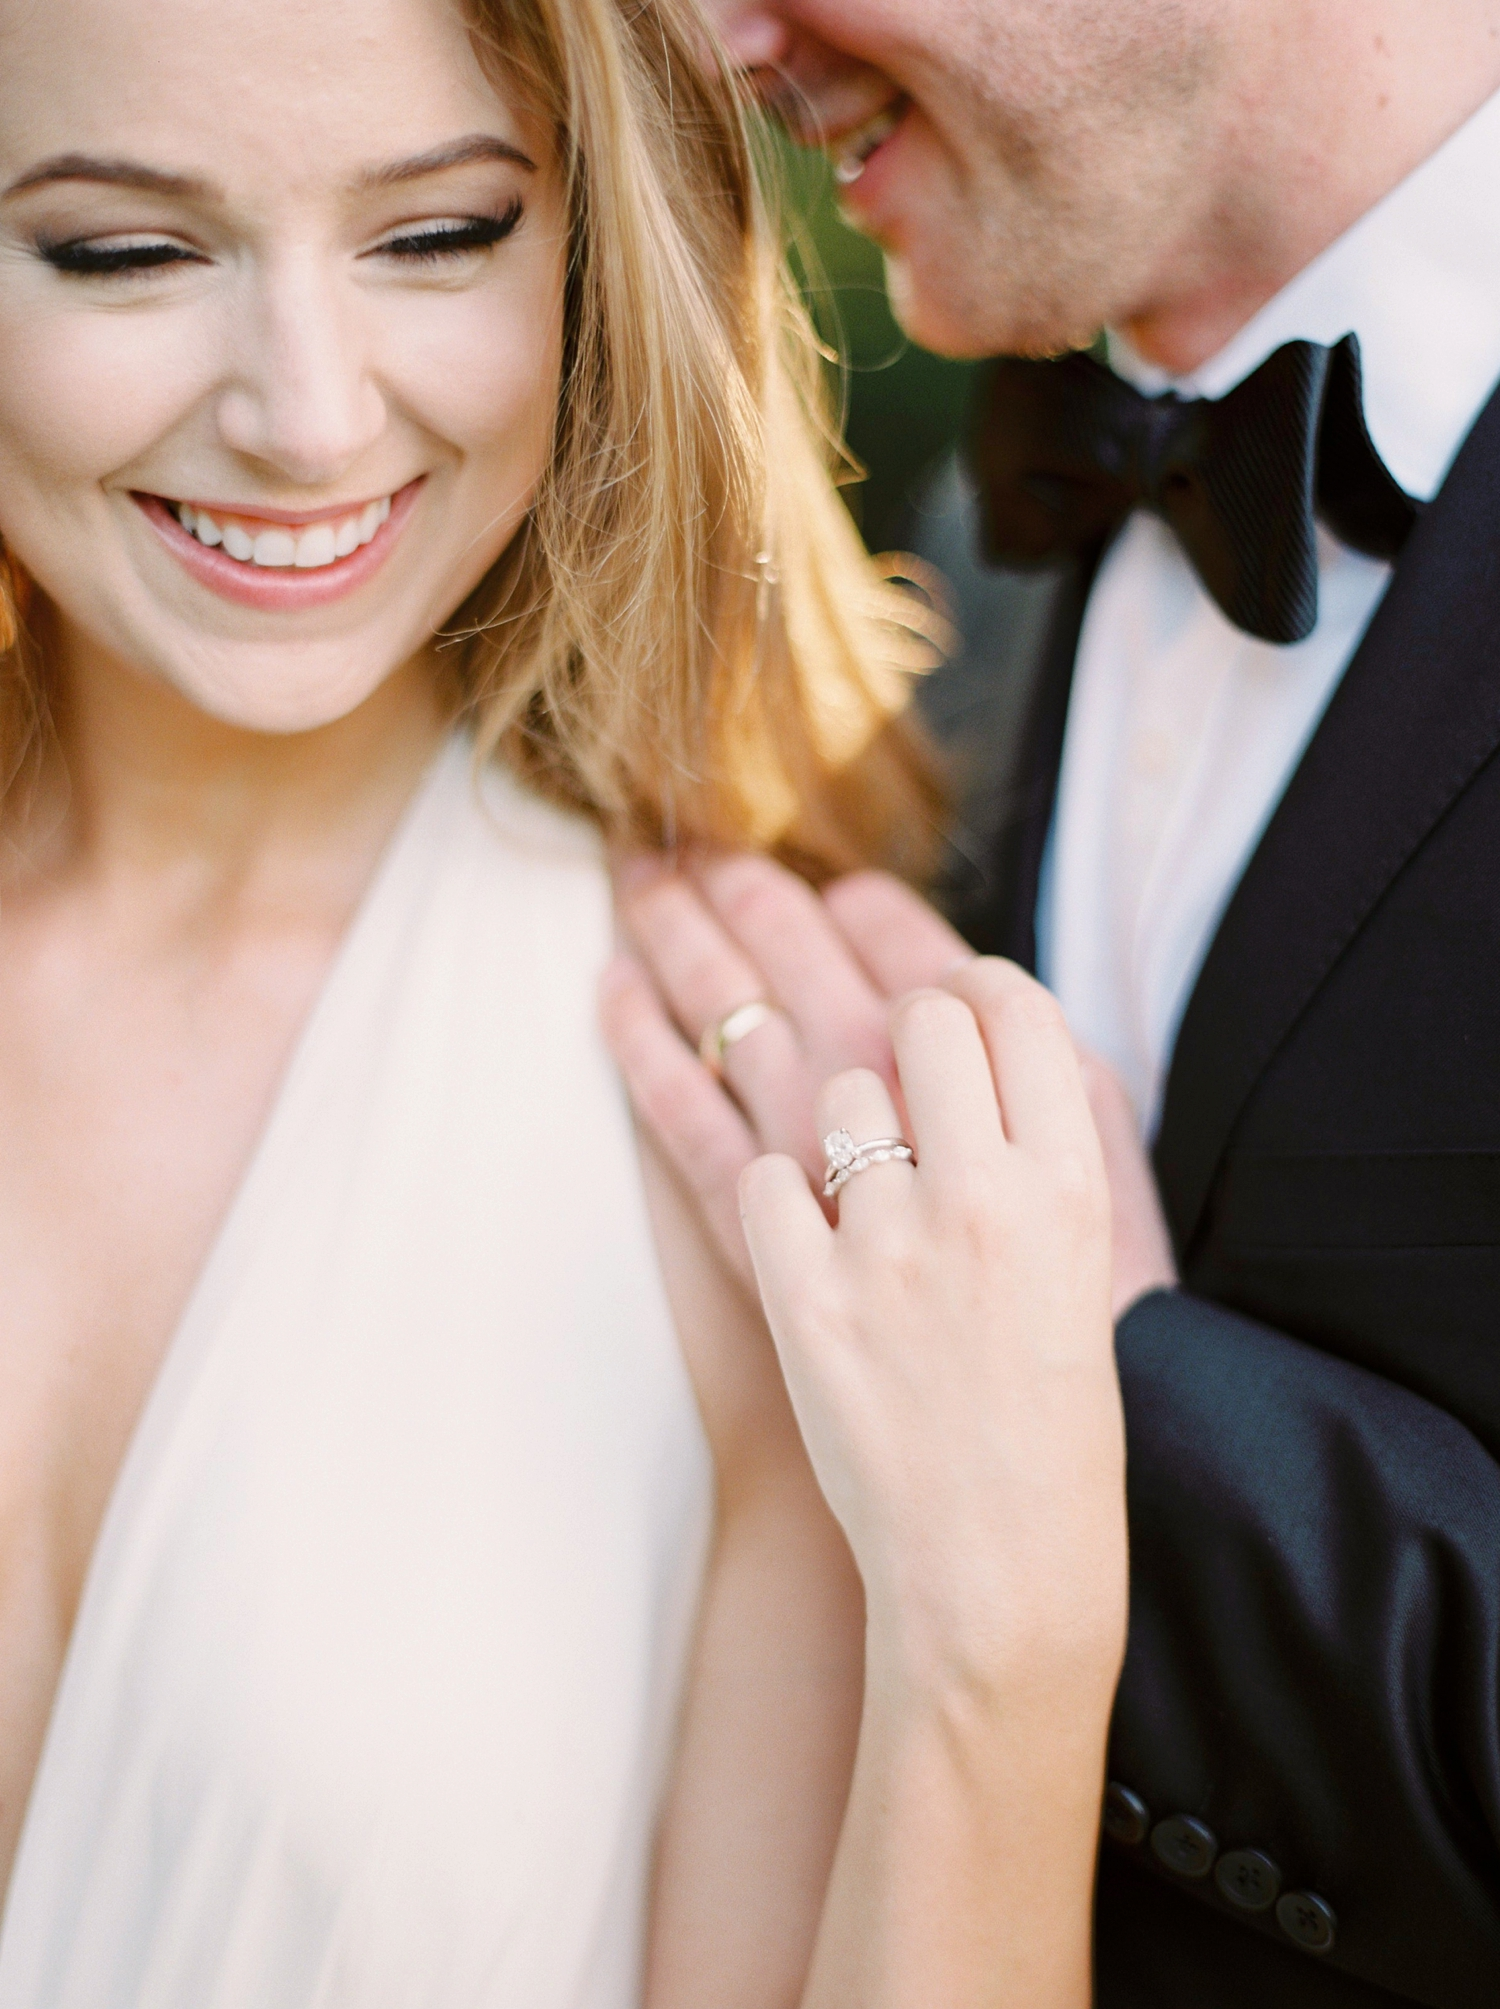 Calgary wedding photographers | georgia wedding photographers | fine art film | Justine Milton Photography | georgia wedding | wedding dress | bride and groom portraits | bouquet